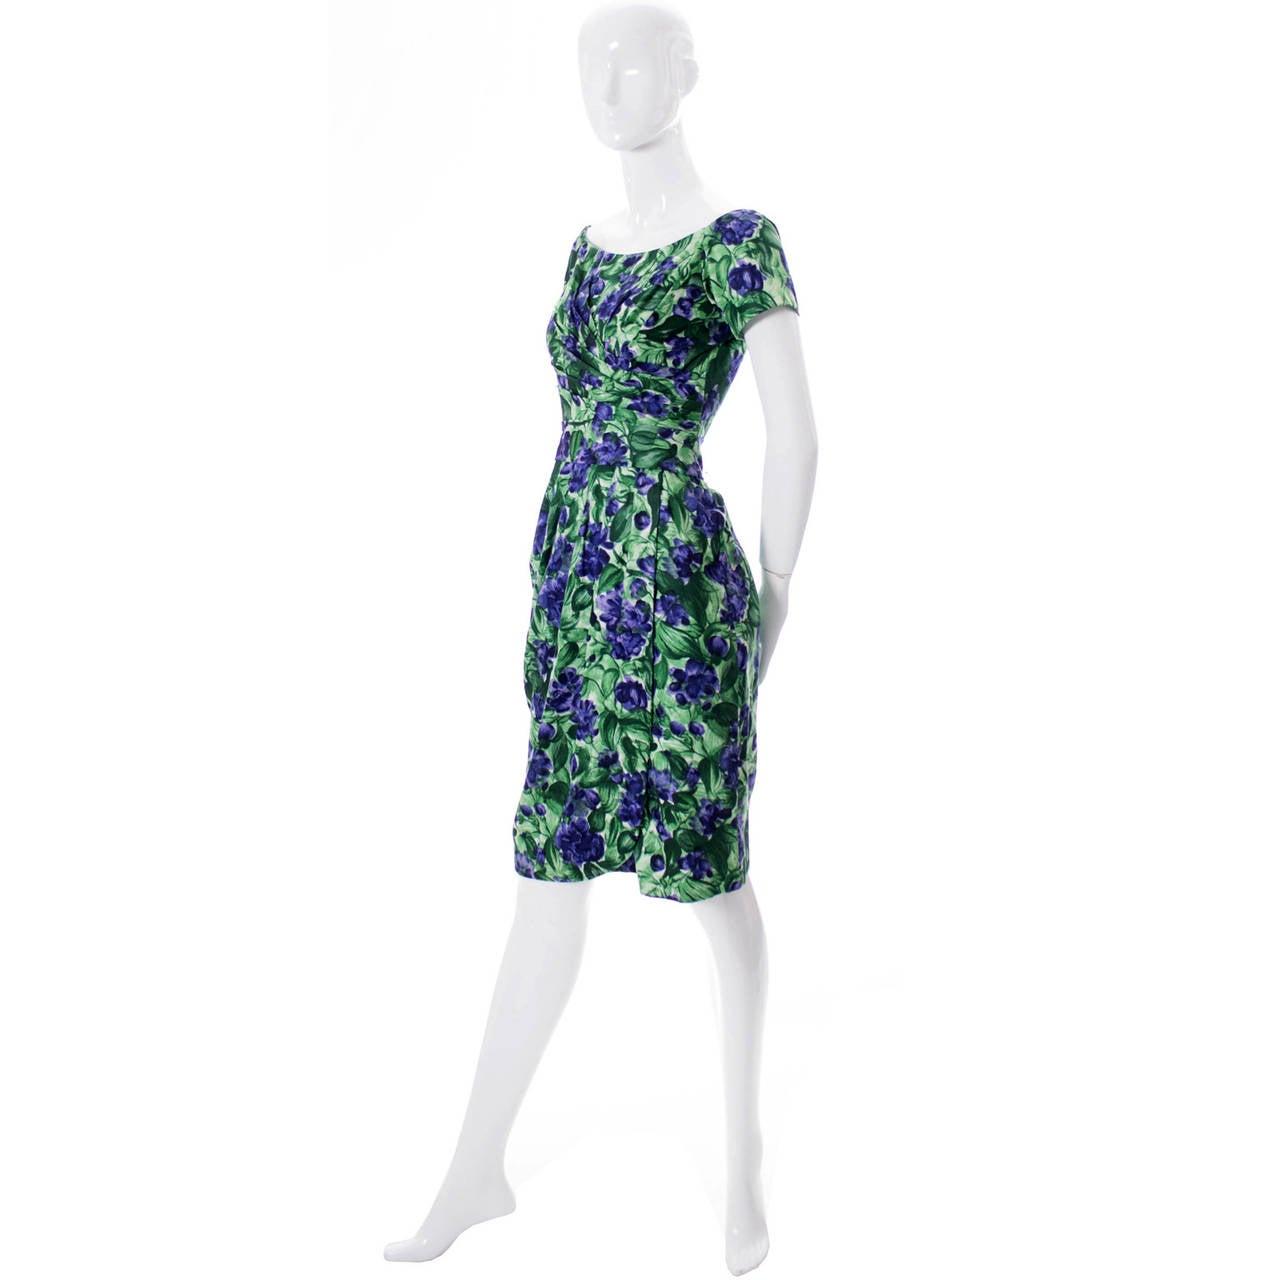 Blue Vintage Ceil Chapman 1950s Dress in Purple Green Floral Silk Print For Sale